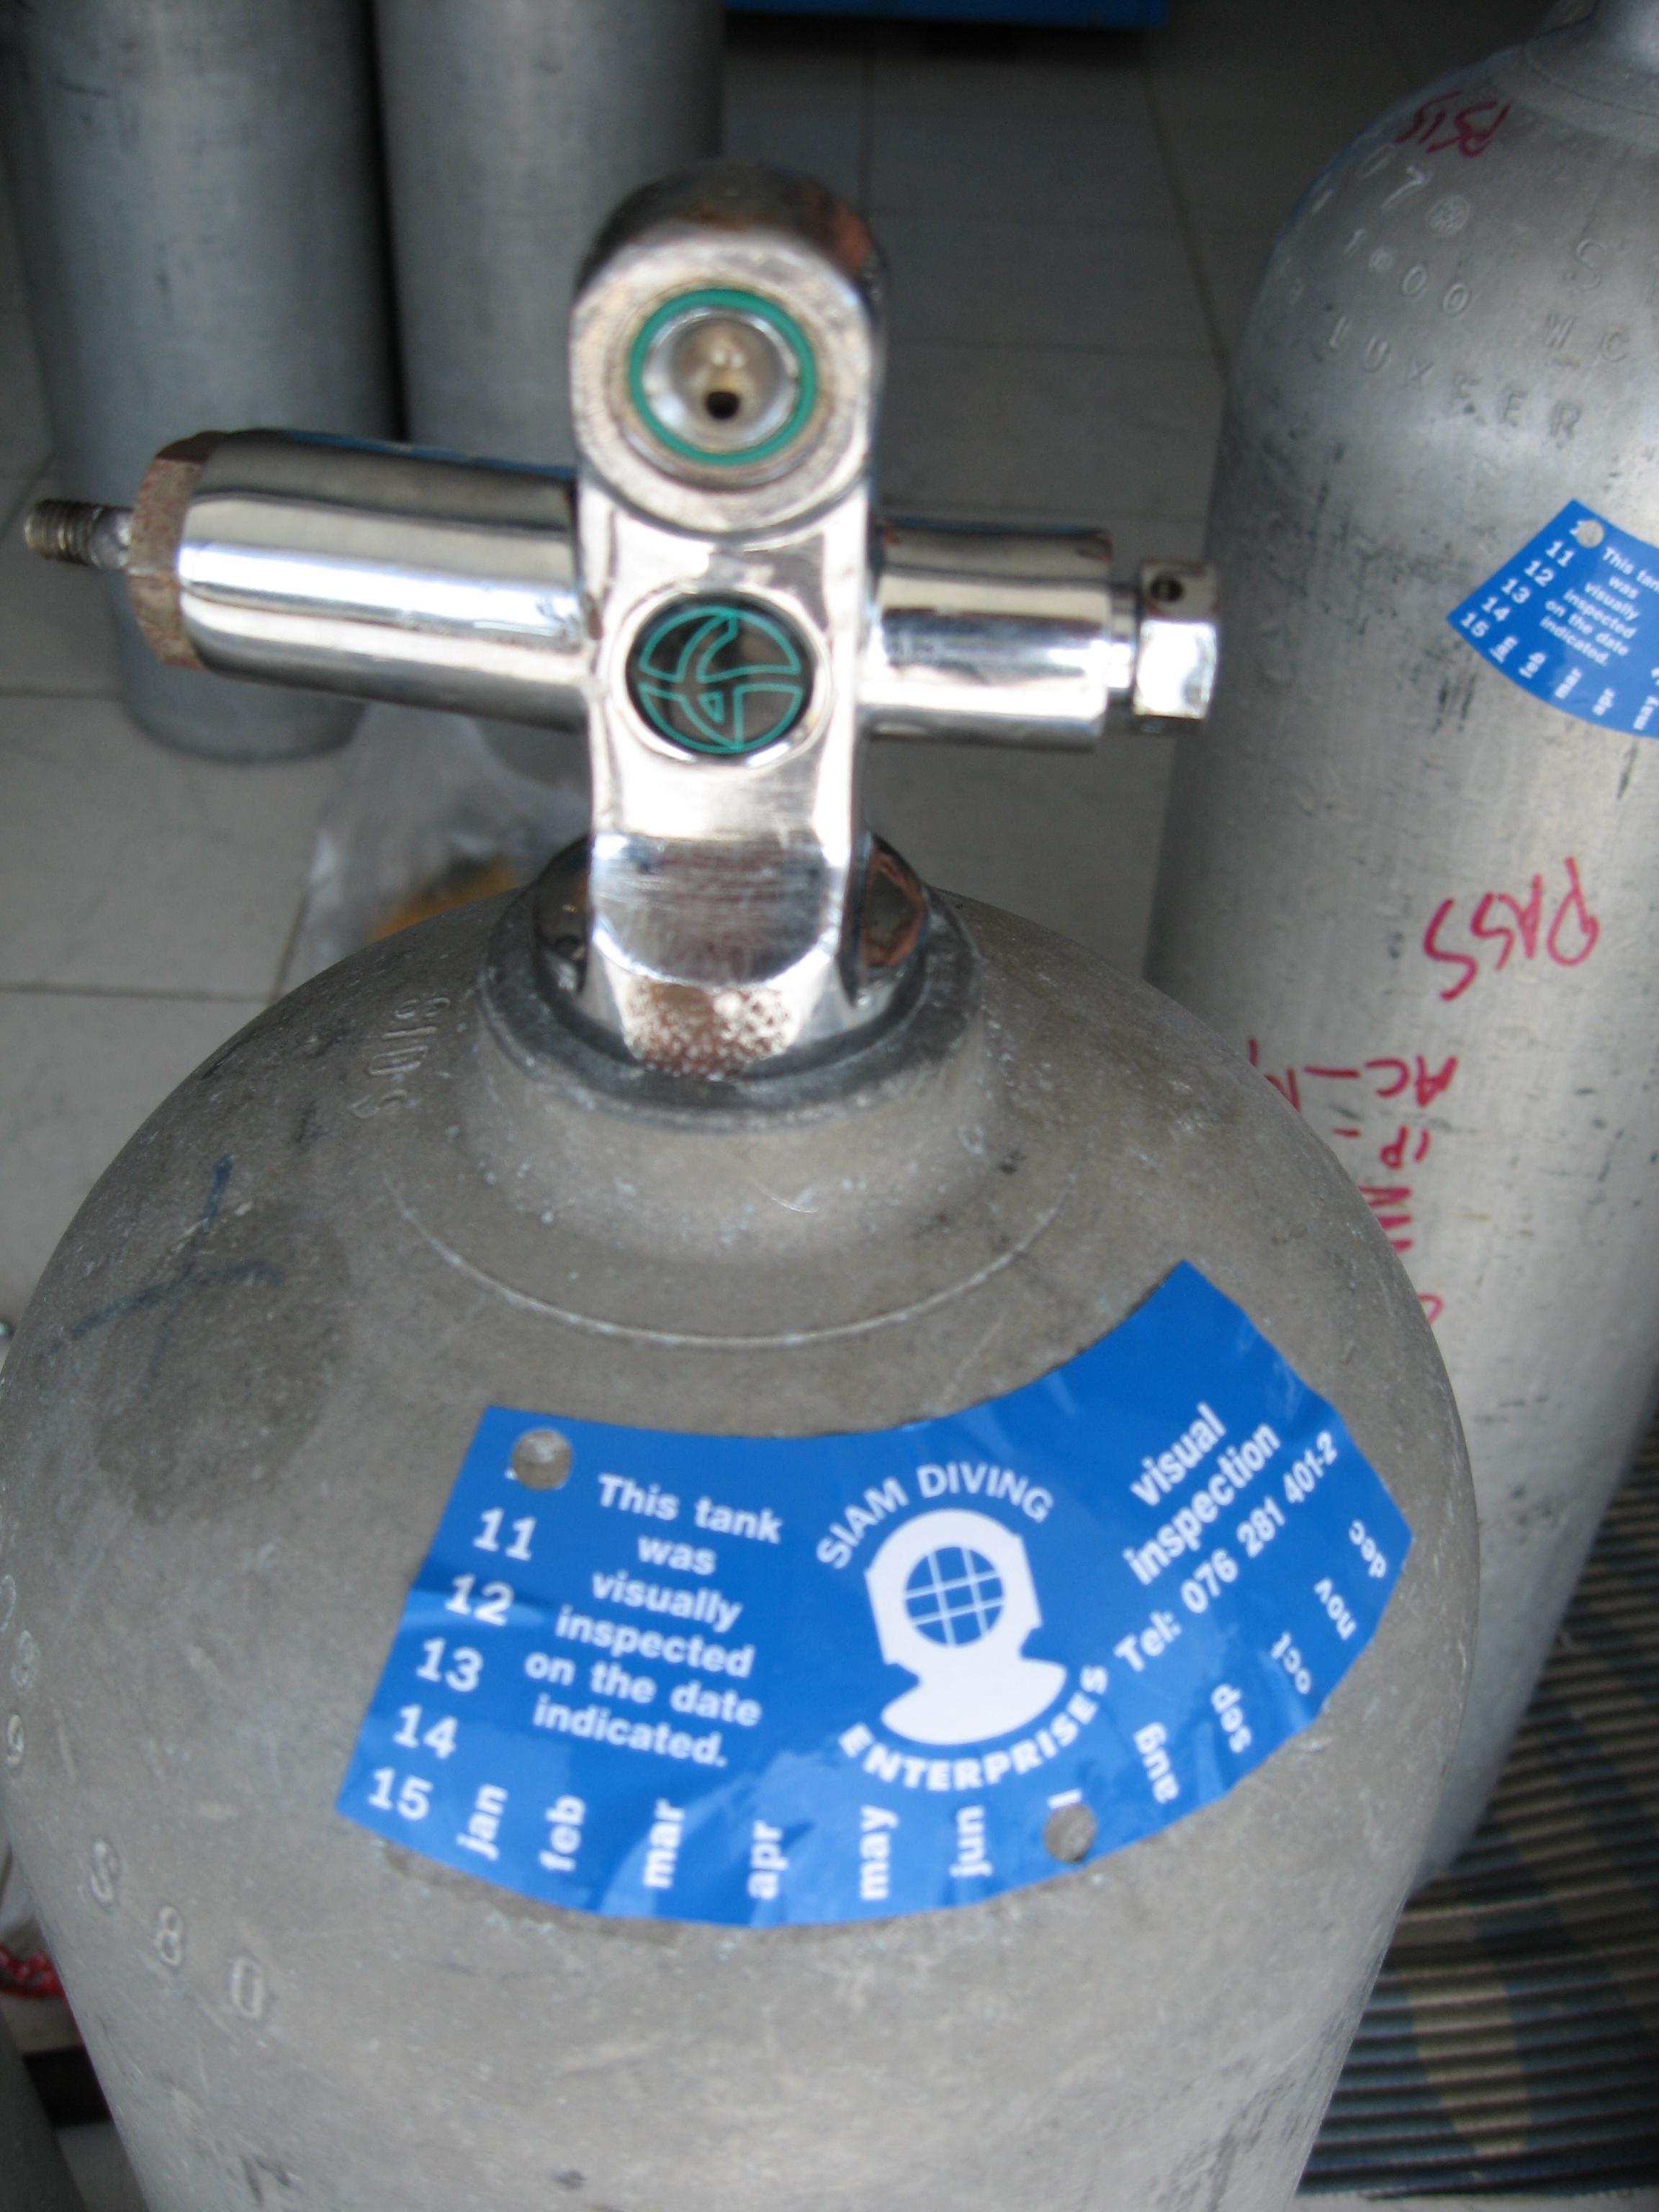 Damage Inspection Sticker Inspection a Vip Sticker